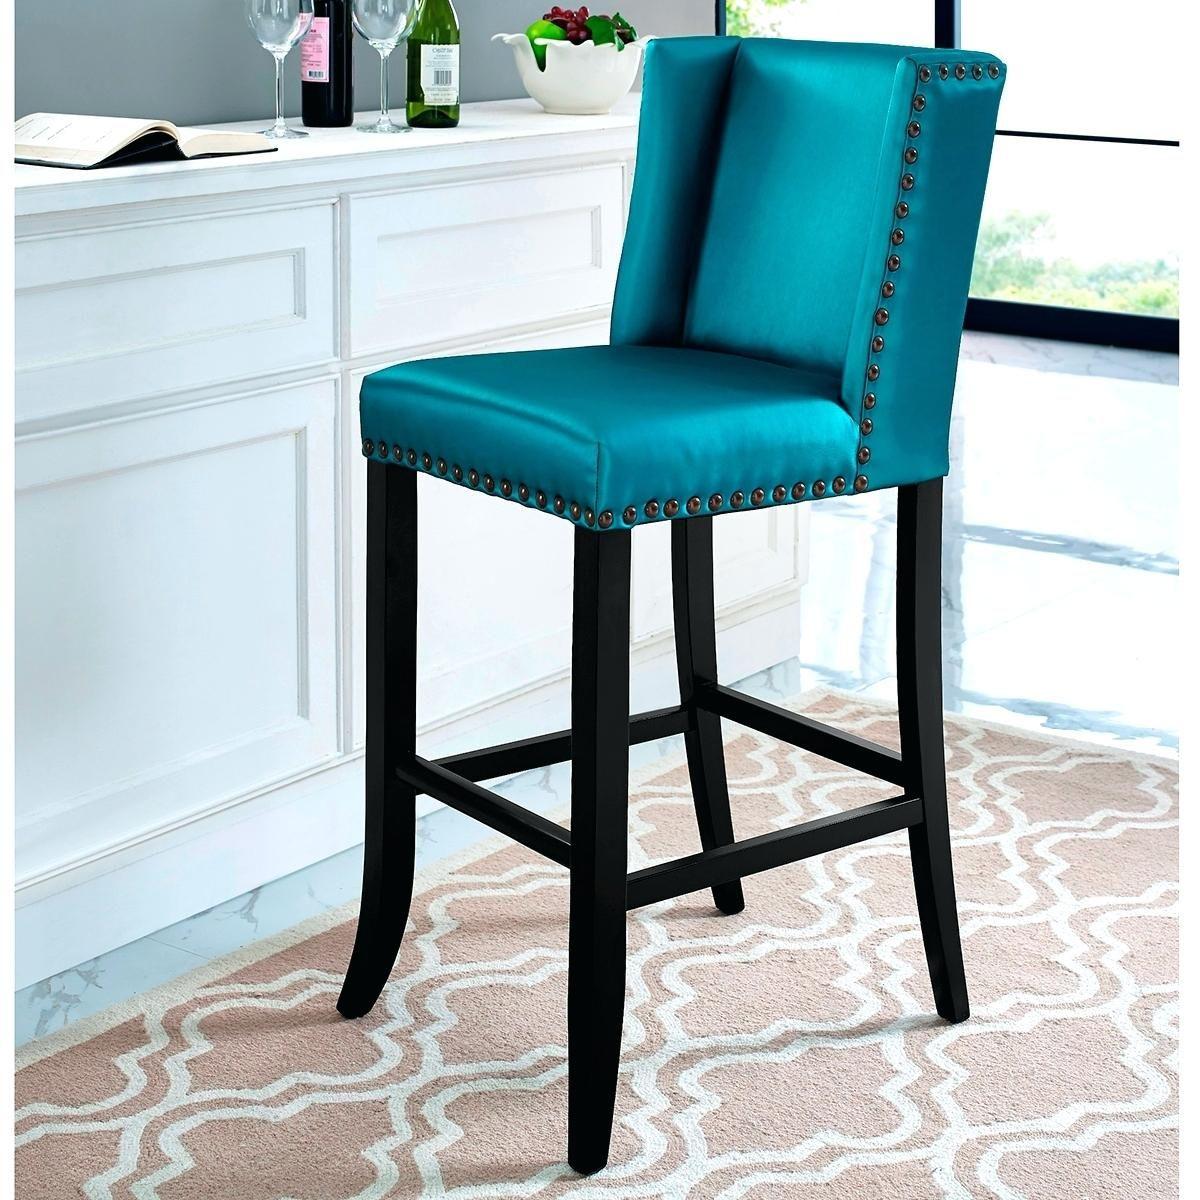 2019 Amazon Ca Bar Stools - Modern Affordable Furniture Check more ...